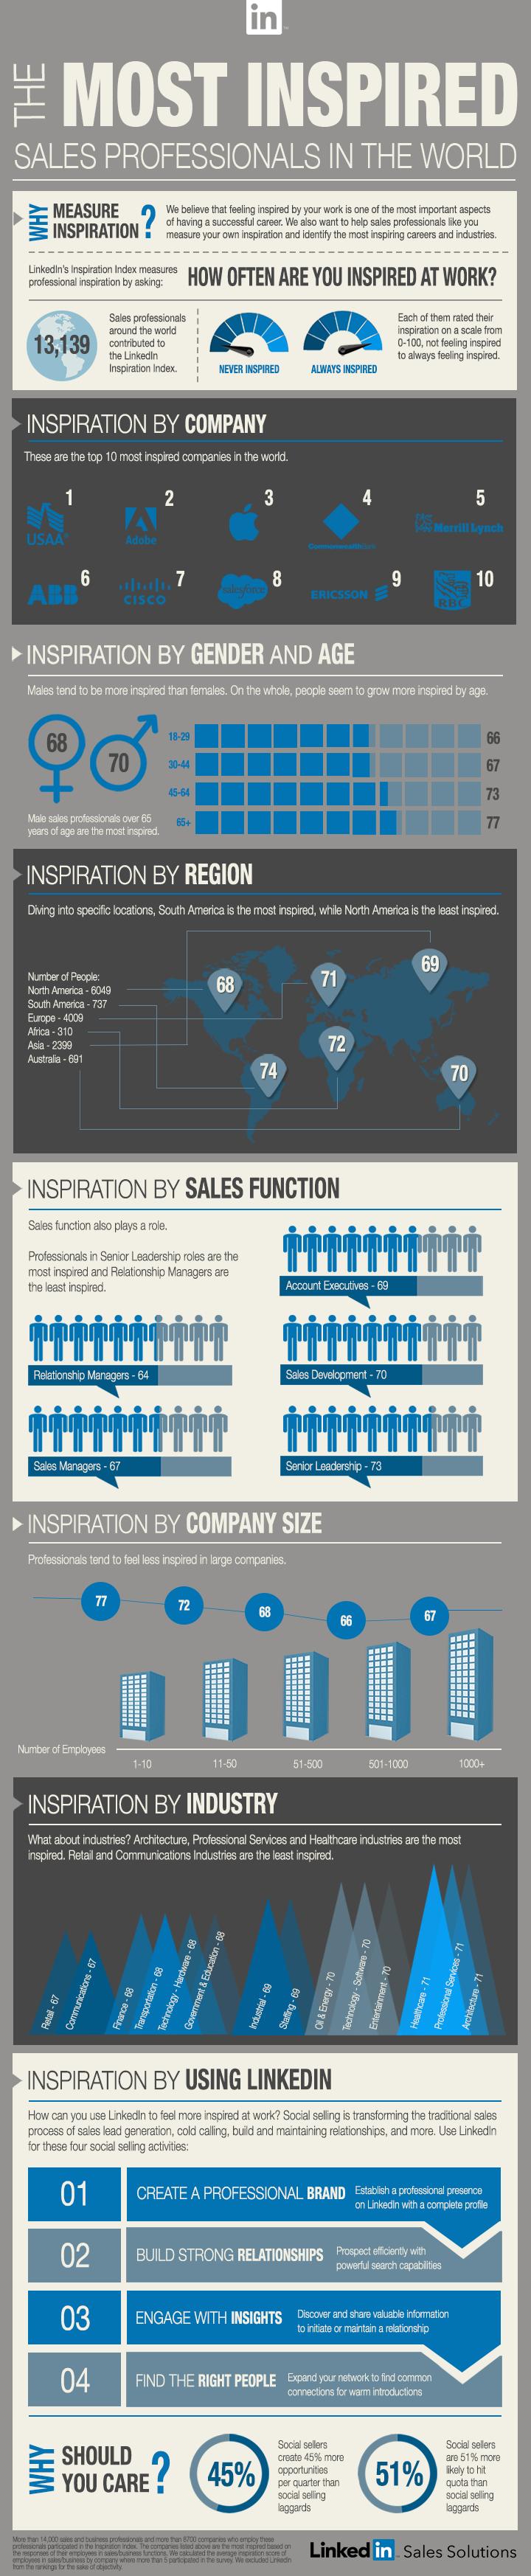 linkedin-inspiration-infographic-FINAL.png